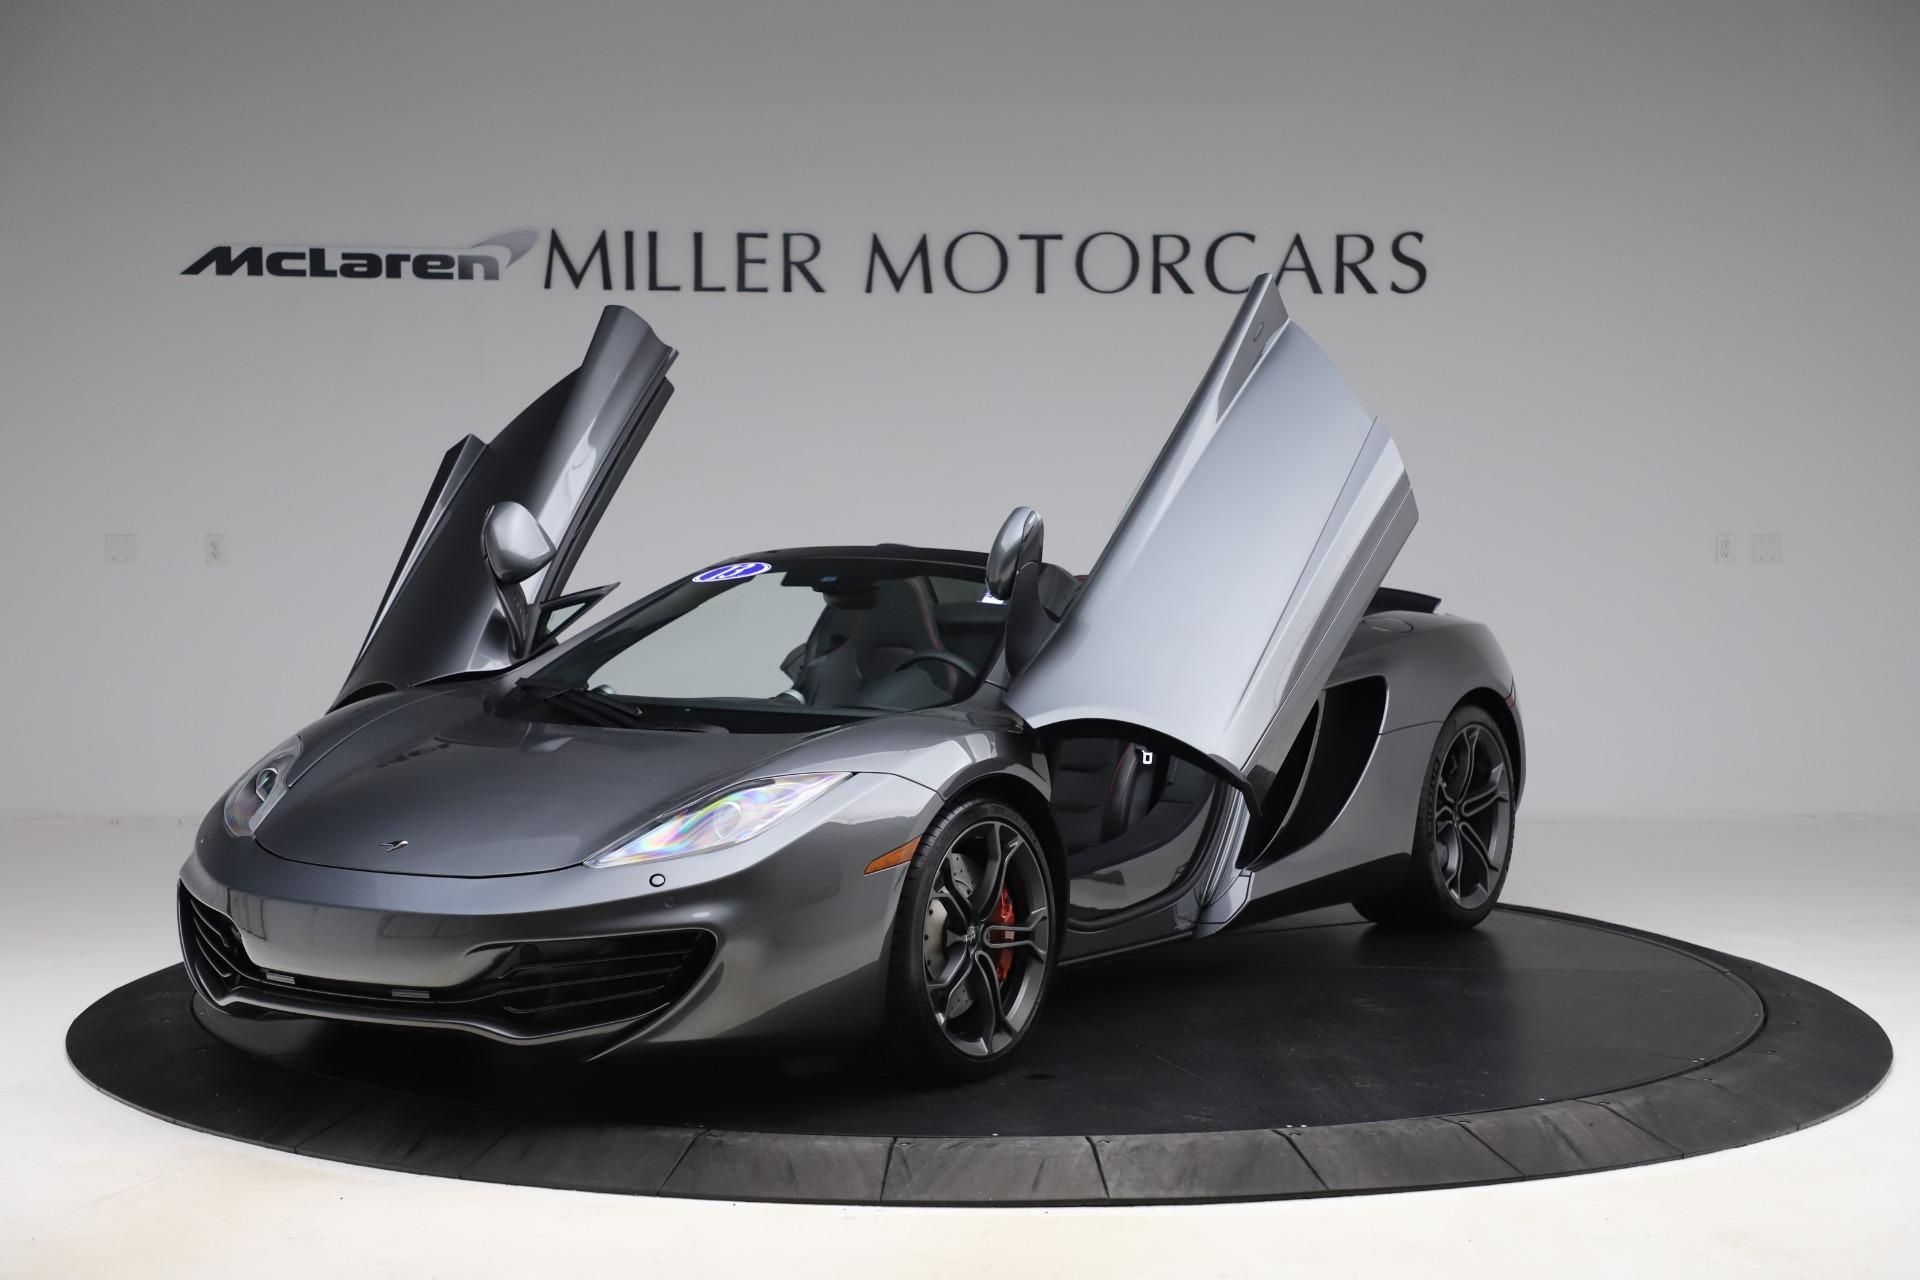 Used-2013-McLaren-MP4-12C-Spider-Convertible